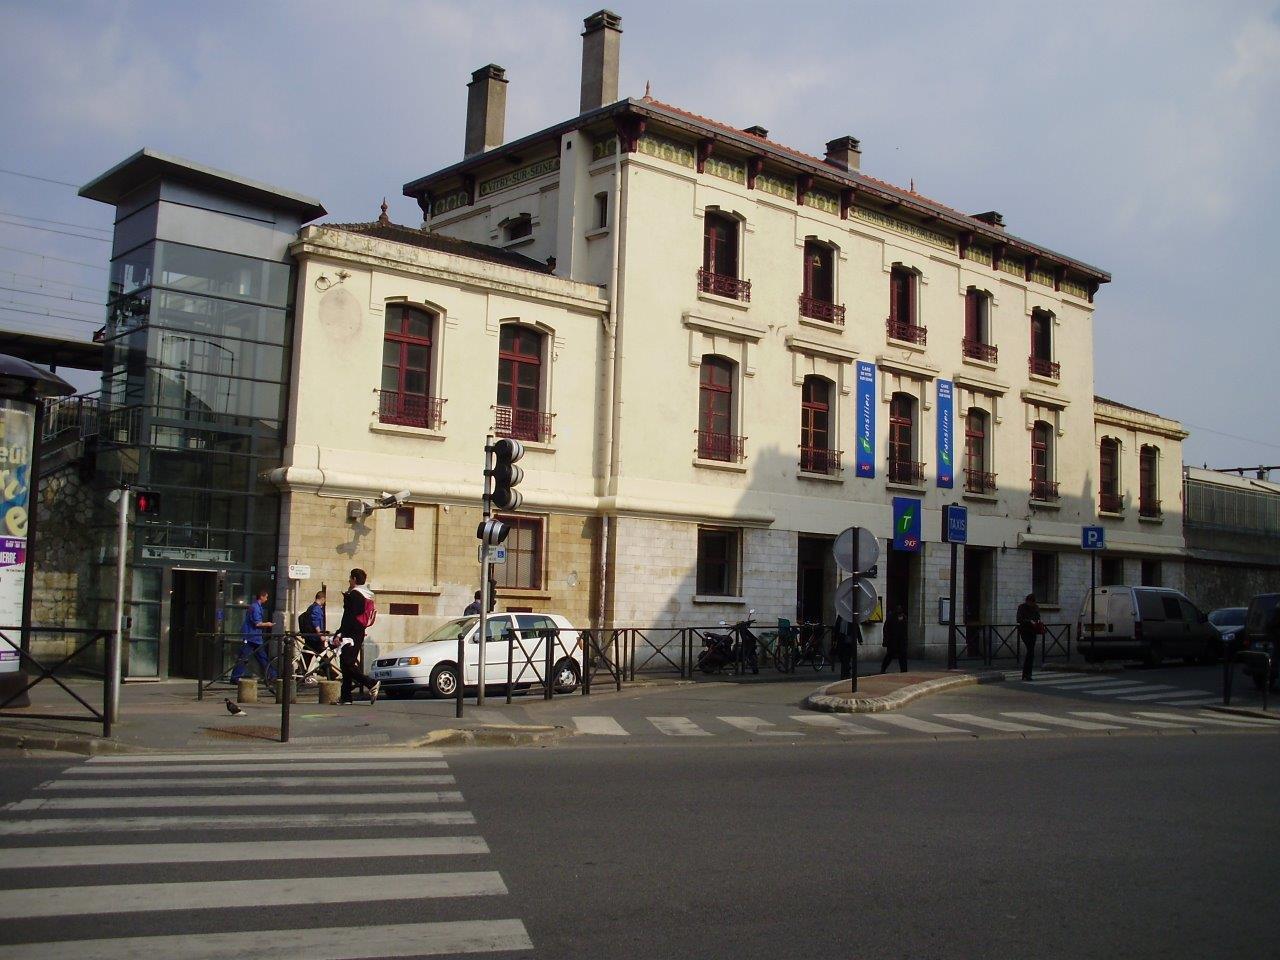 gare-de-vitry-sur-seine-train-station